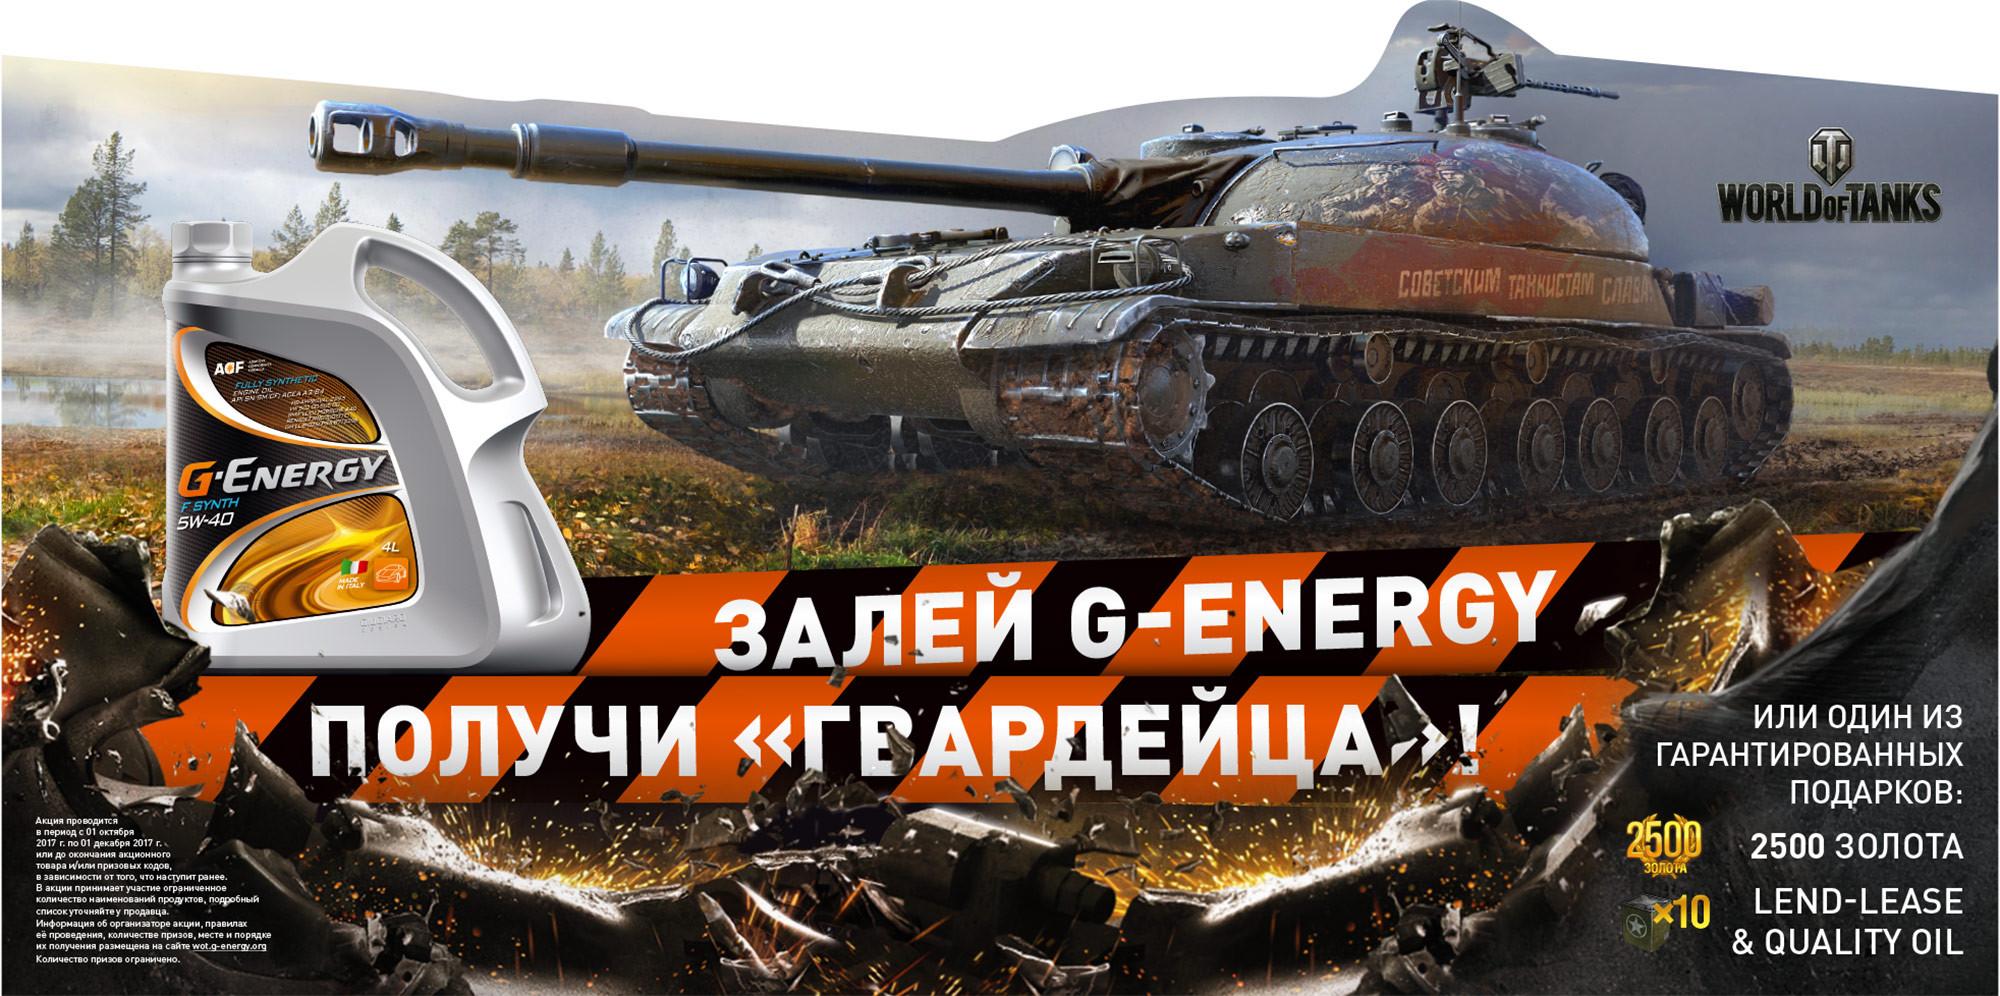 G-Energy-WoT-2017-05-sticker.jpg